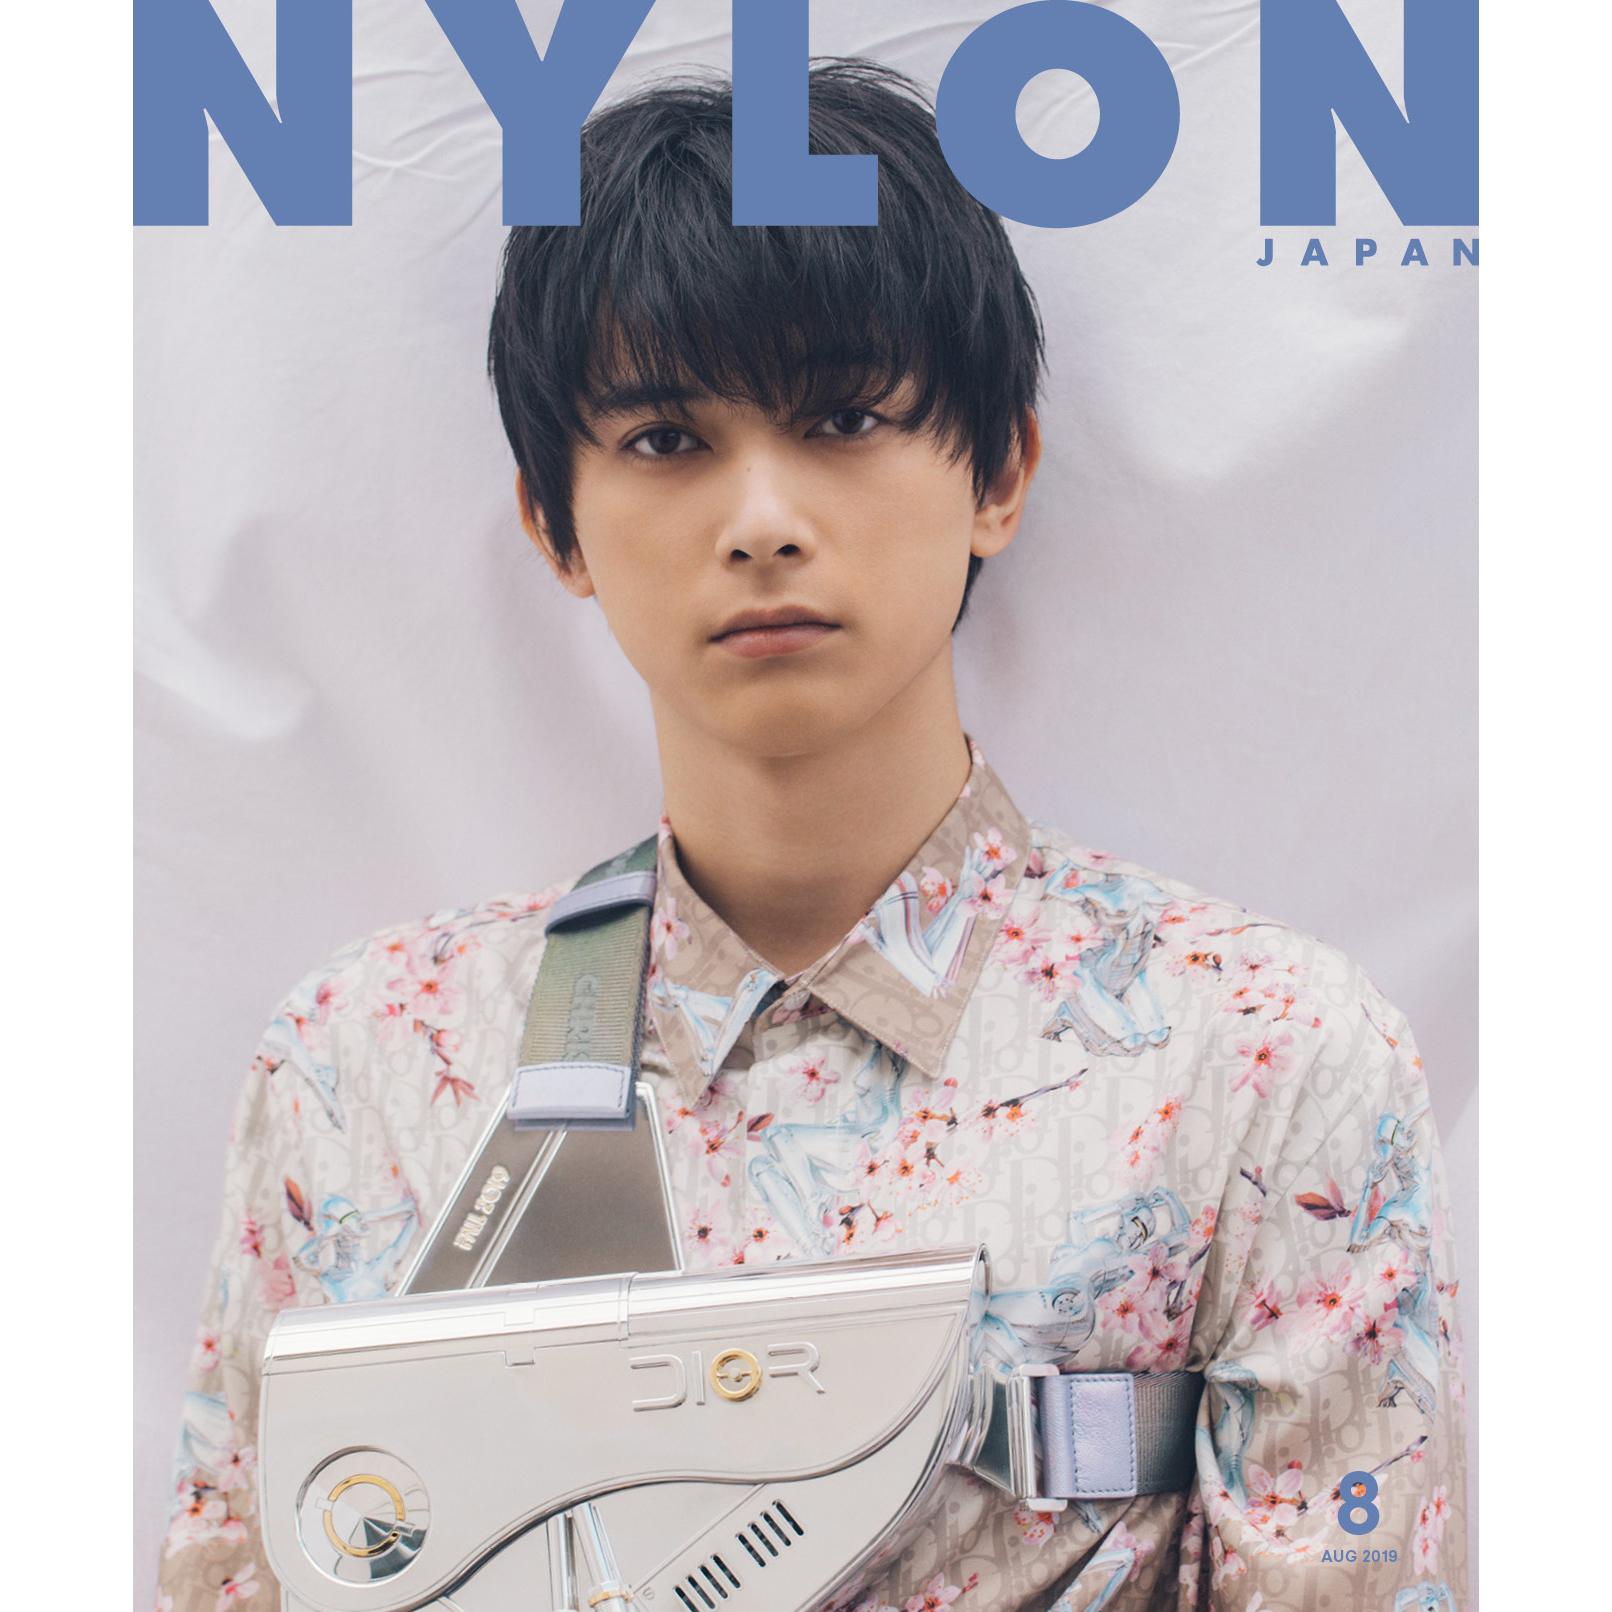 NYLON JAPAN 8 月号 吉沢亮